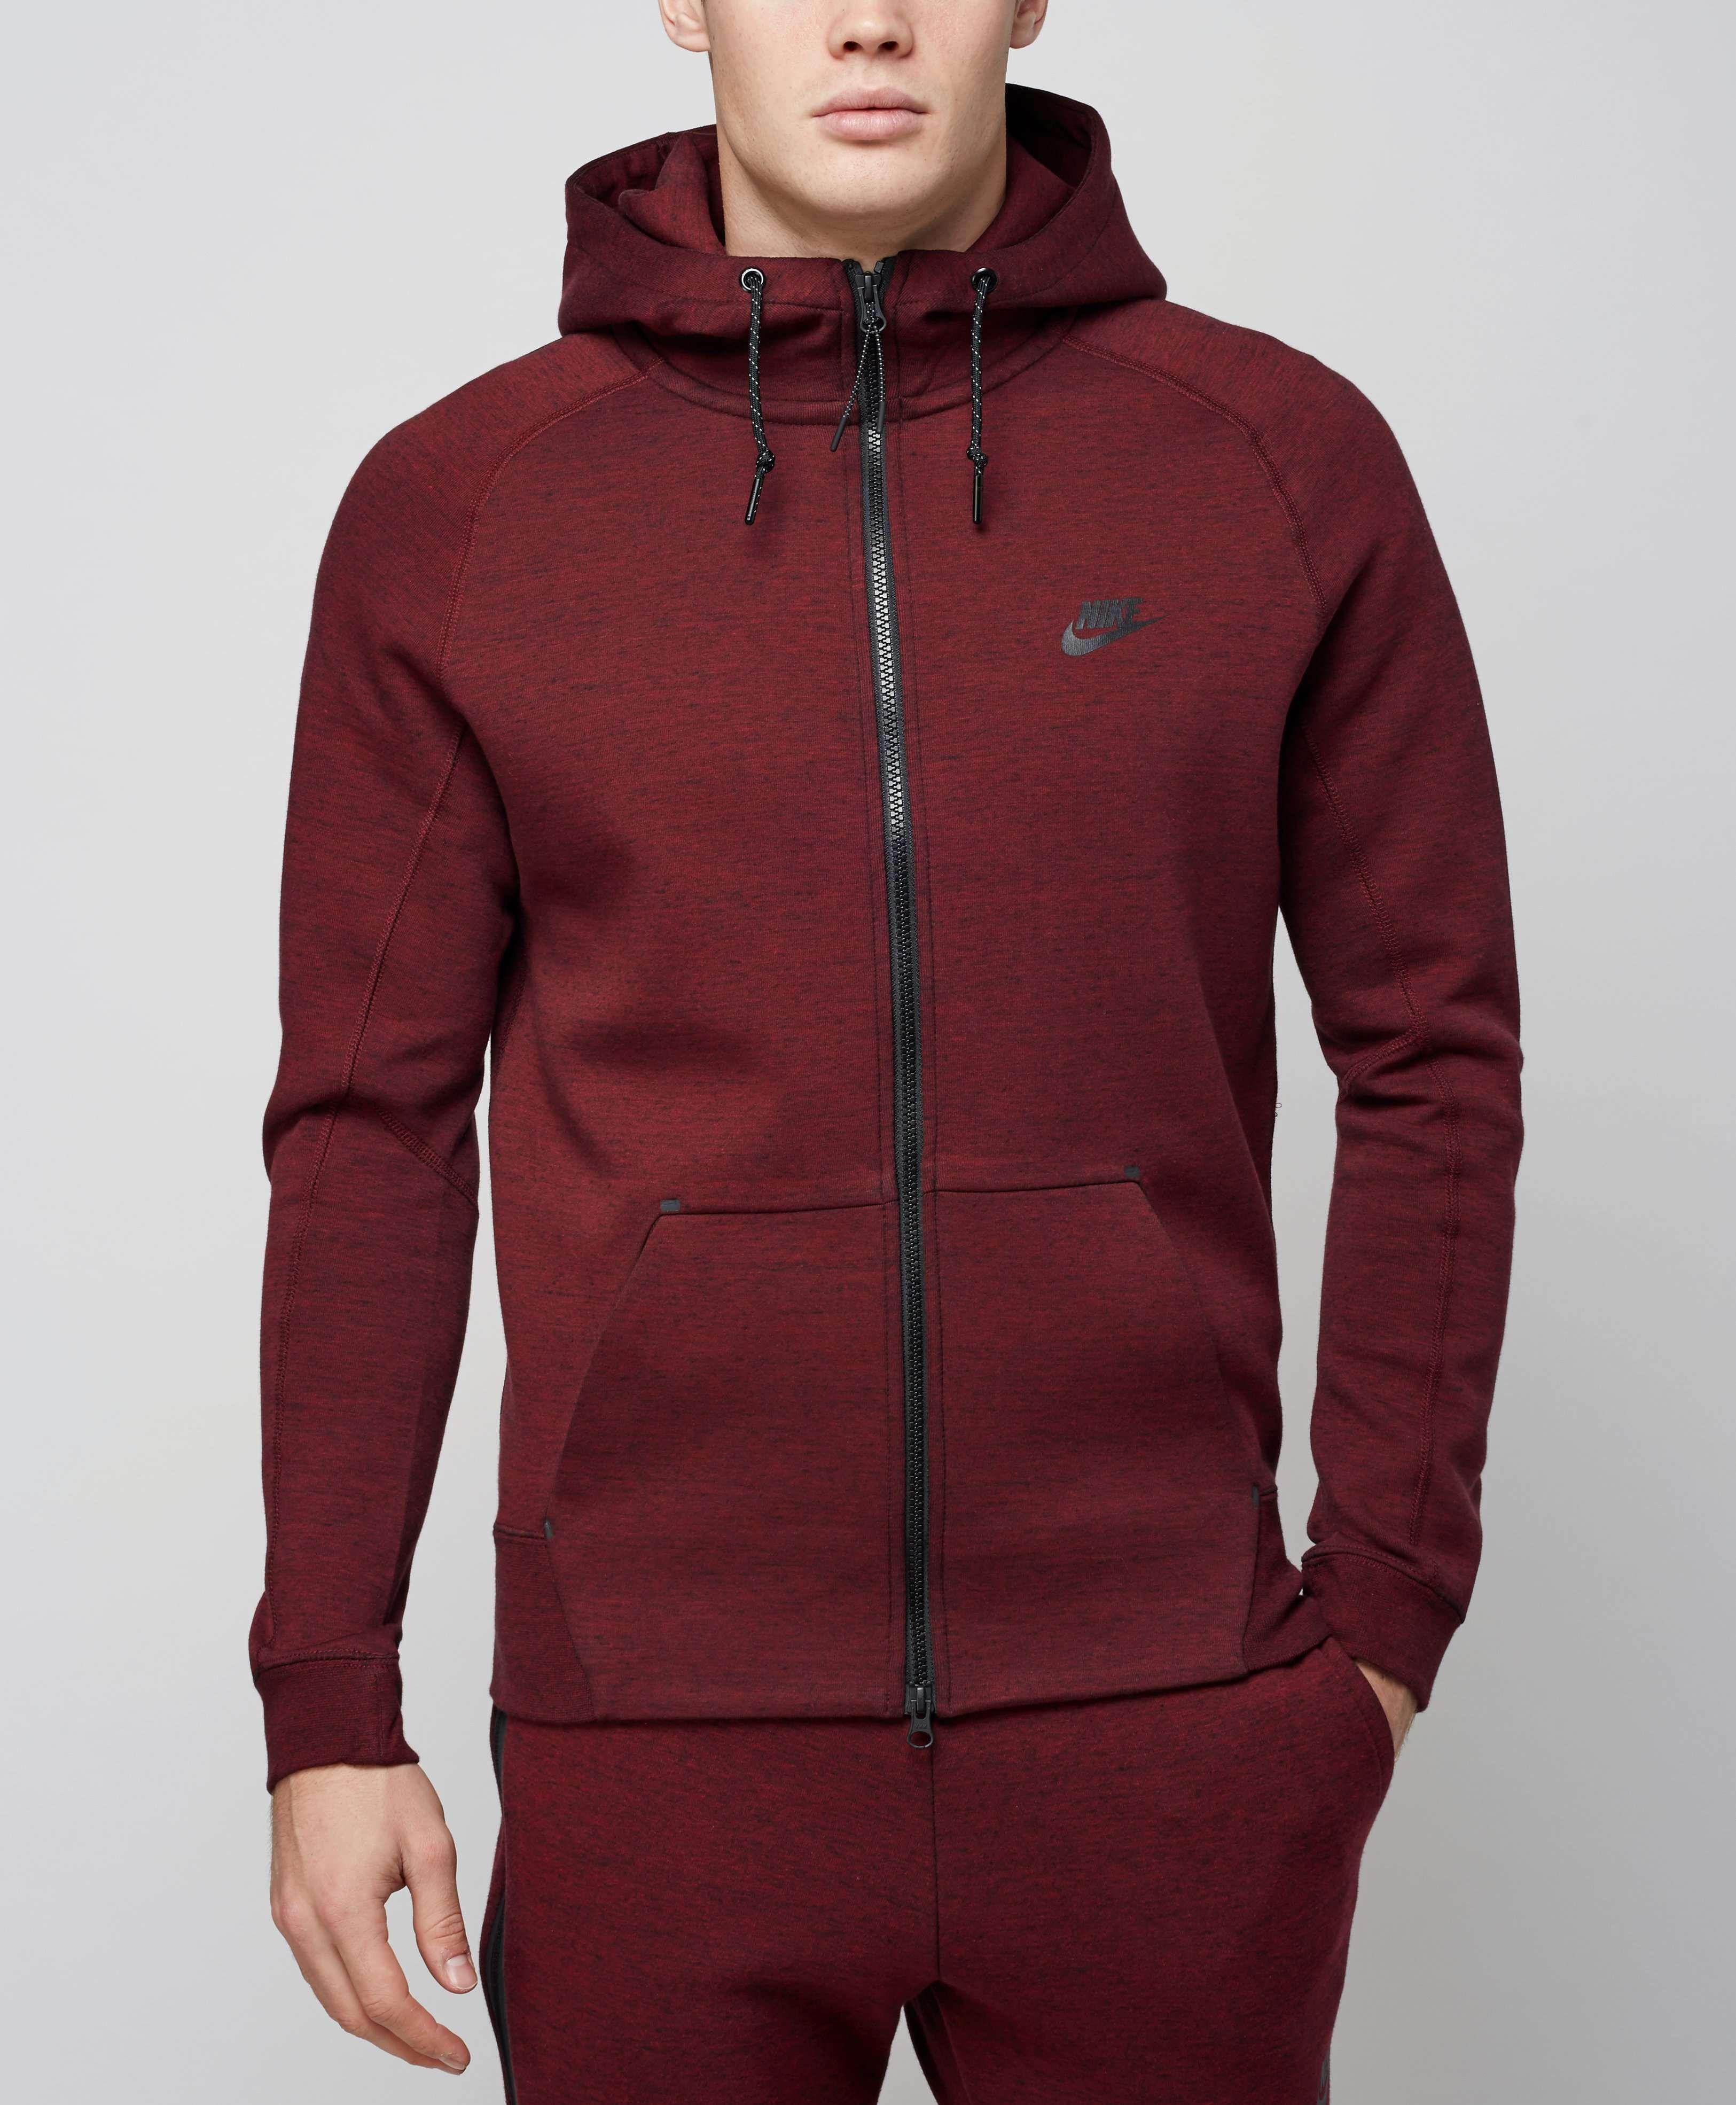 9e89783eb06 Classic-fit Z63t7829 Nike Tech Fleece AW77 Full Zip Hoodie New ...